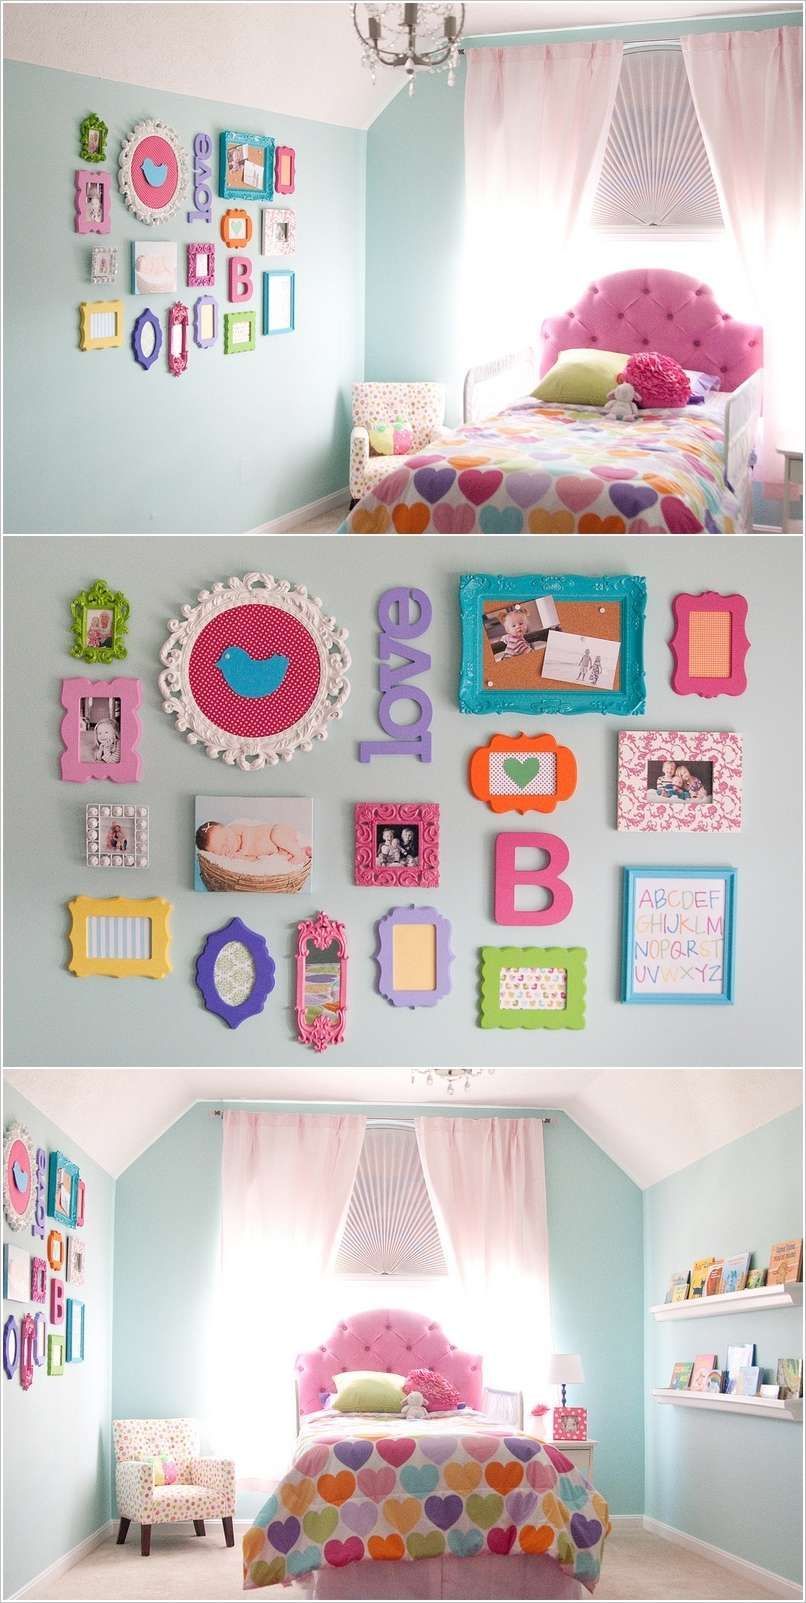 Best 25+ Girls Bedroom Decorating Ideas On Pinterest | Girls Bedroom, Girl  Bedroom Decorations And Rooms For Teenage Girl